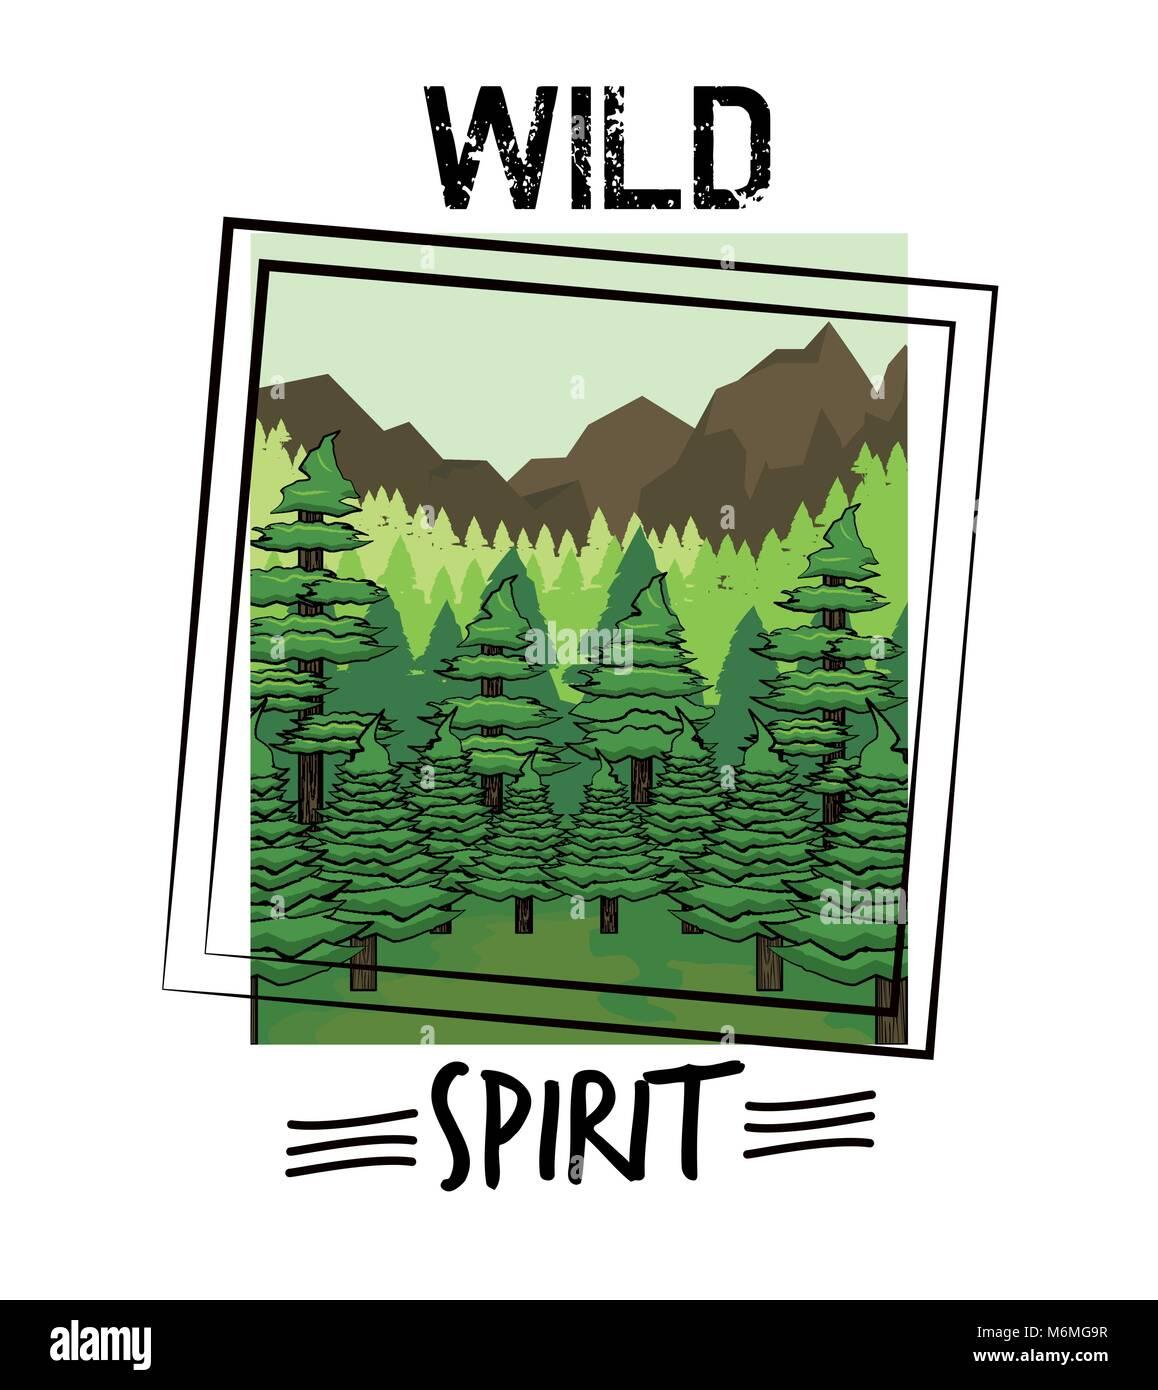 Wild nature spirit print for t shirt - Stock Image